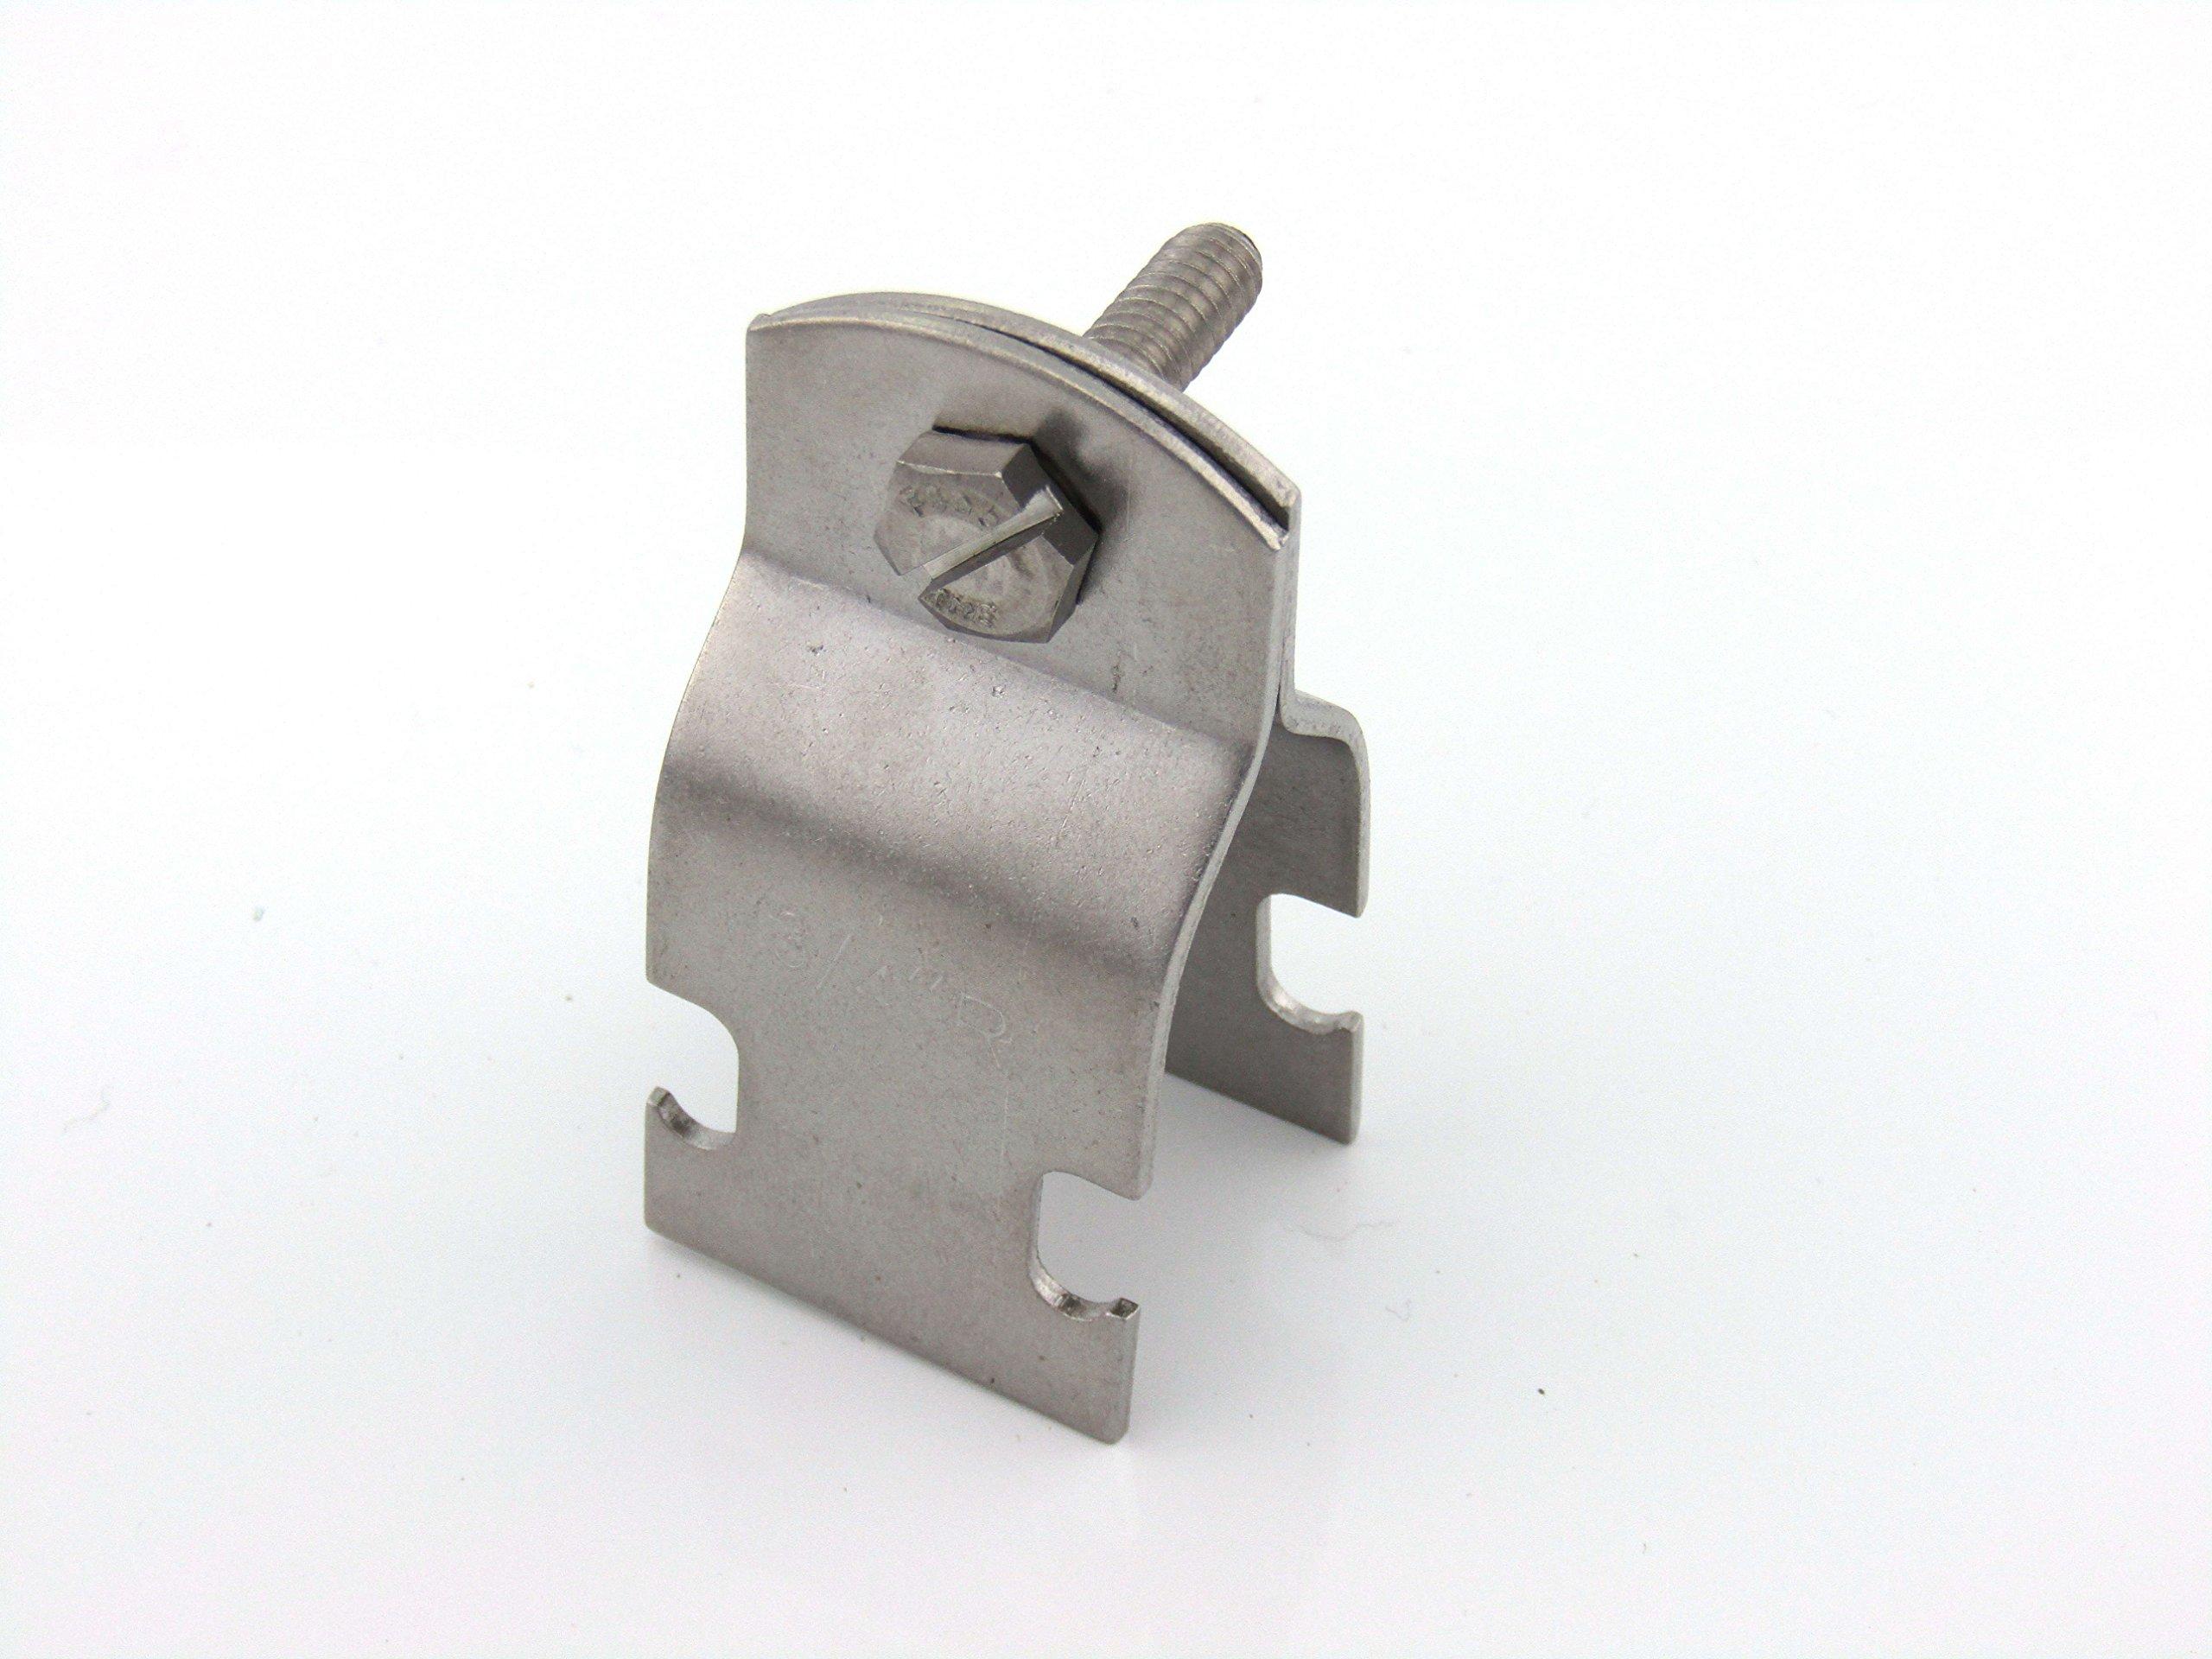 3/4in STD Pipe & Rigid Conduit Clamp; 304 S/S (100 per box) by ARWS